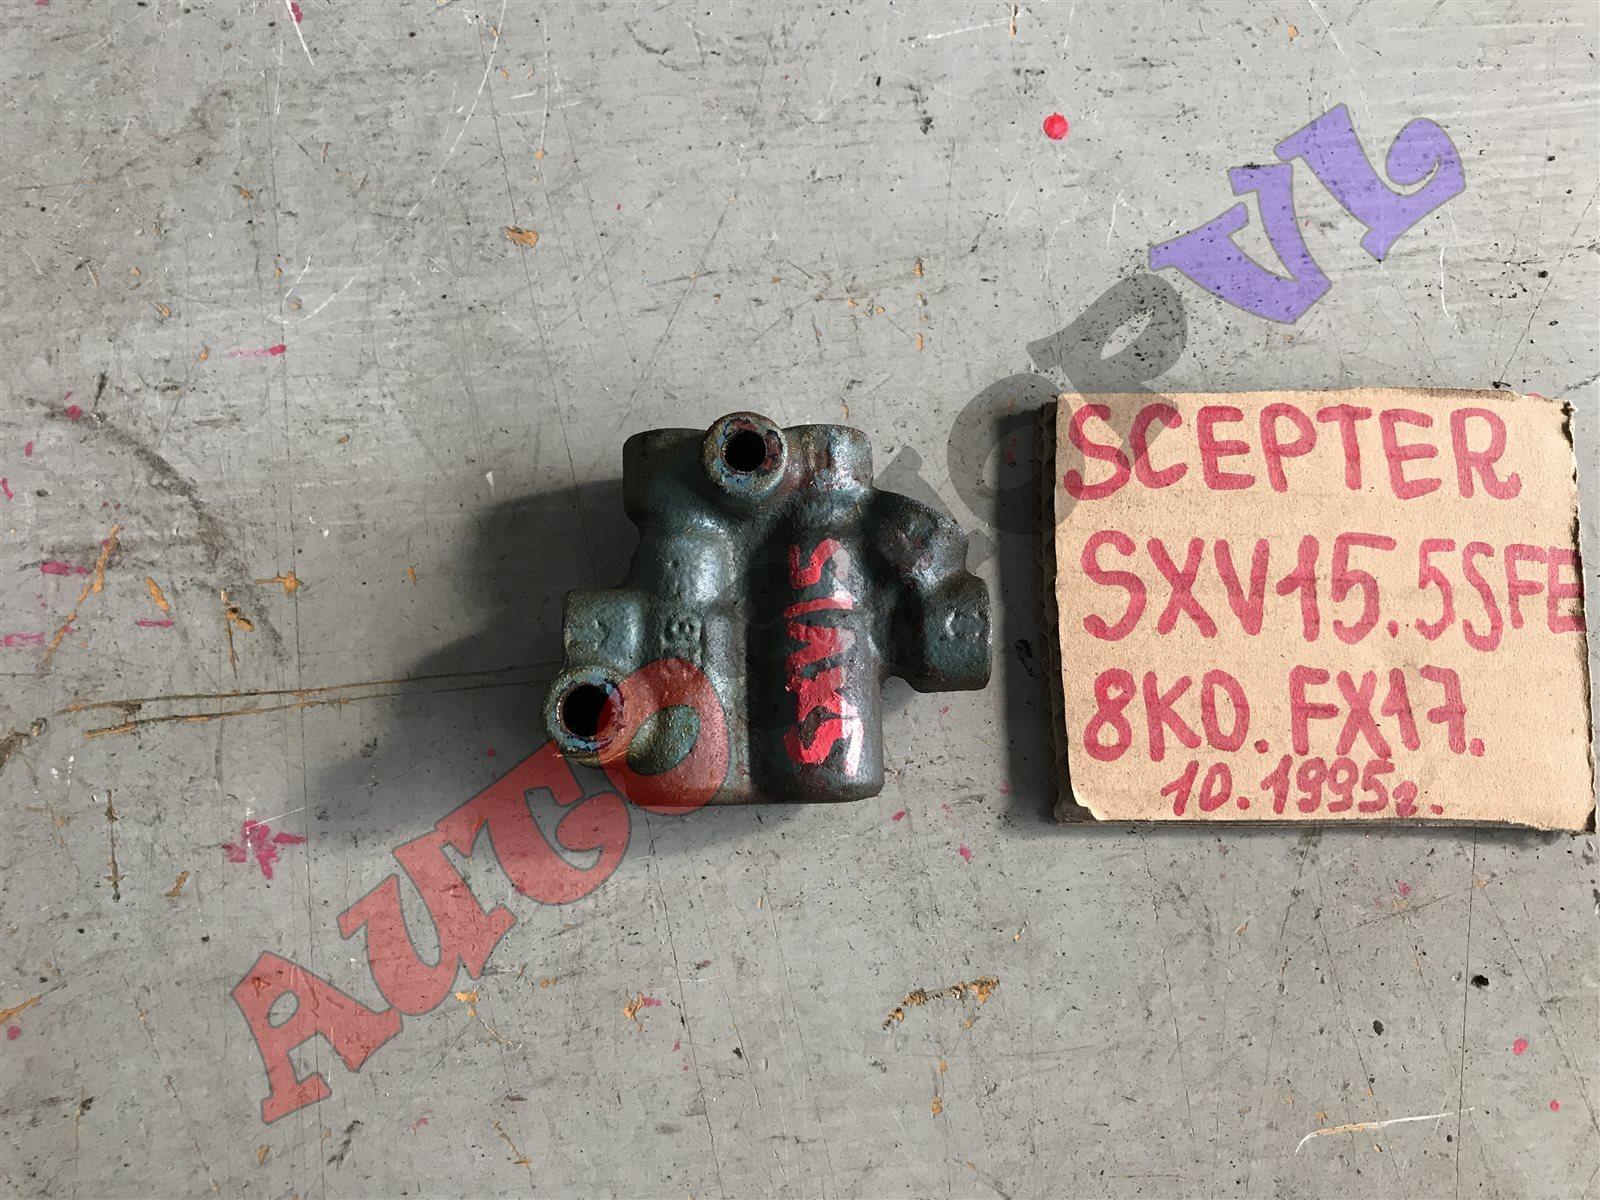 Распределитель тормозной Toyota Scepter SXV15W 5SFE 10.1995 (б/у)